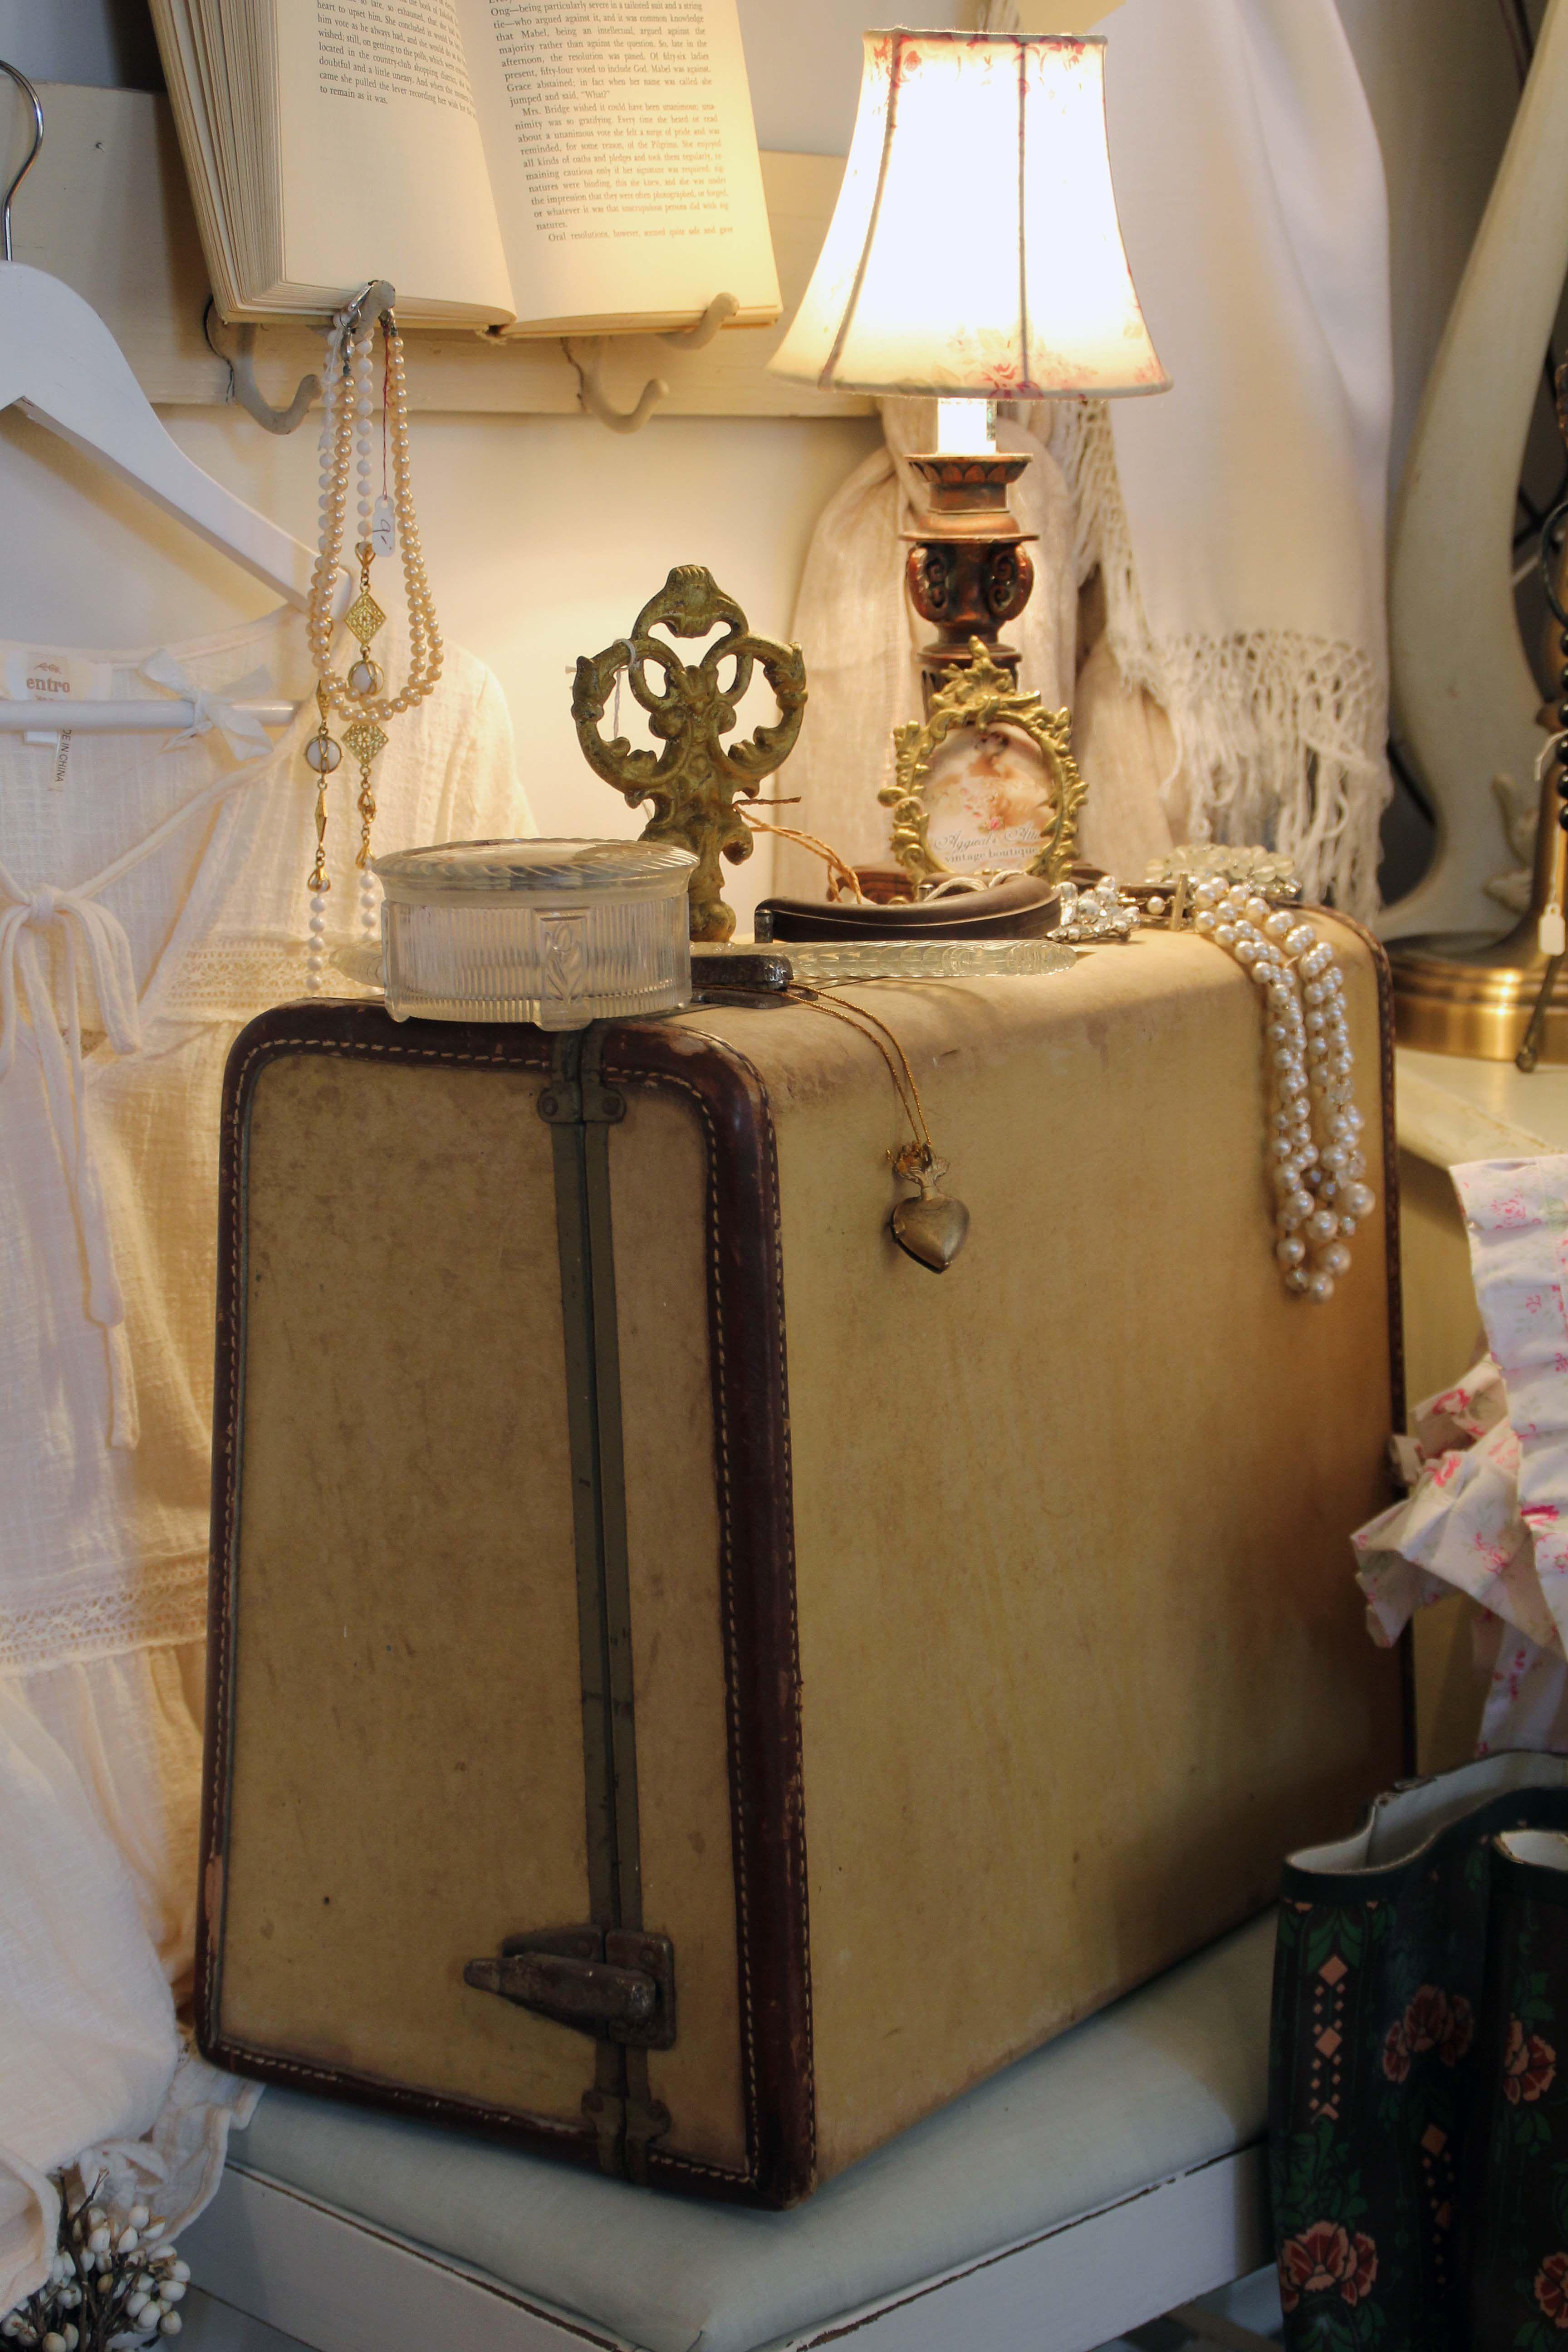 Vintage Boutique Aggieal S Attic In Liberty Mo Vintage Display Antique Shops Kids Boutique